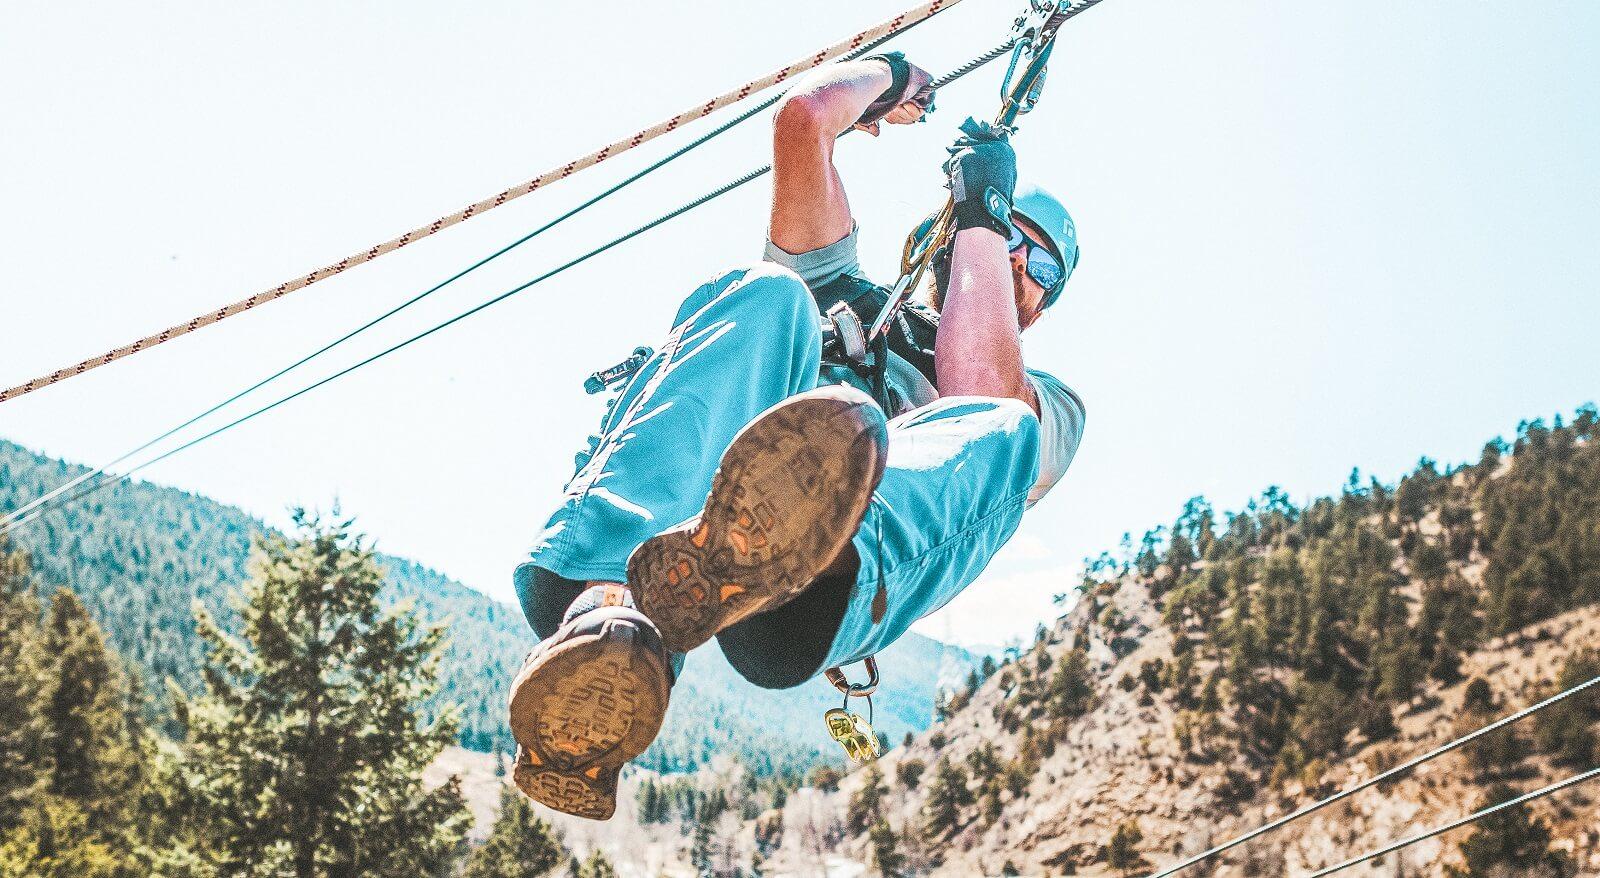 Cliffside Zipline in Idaho Springs